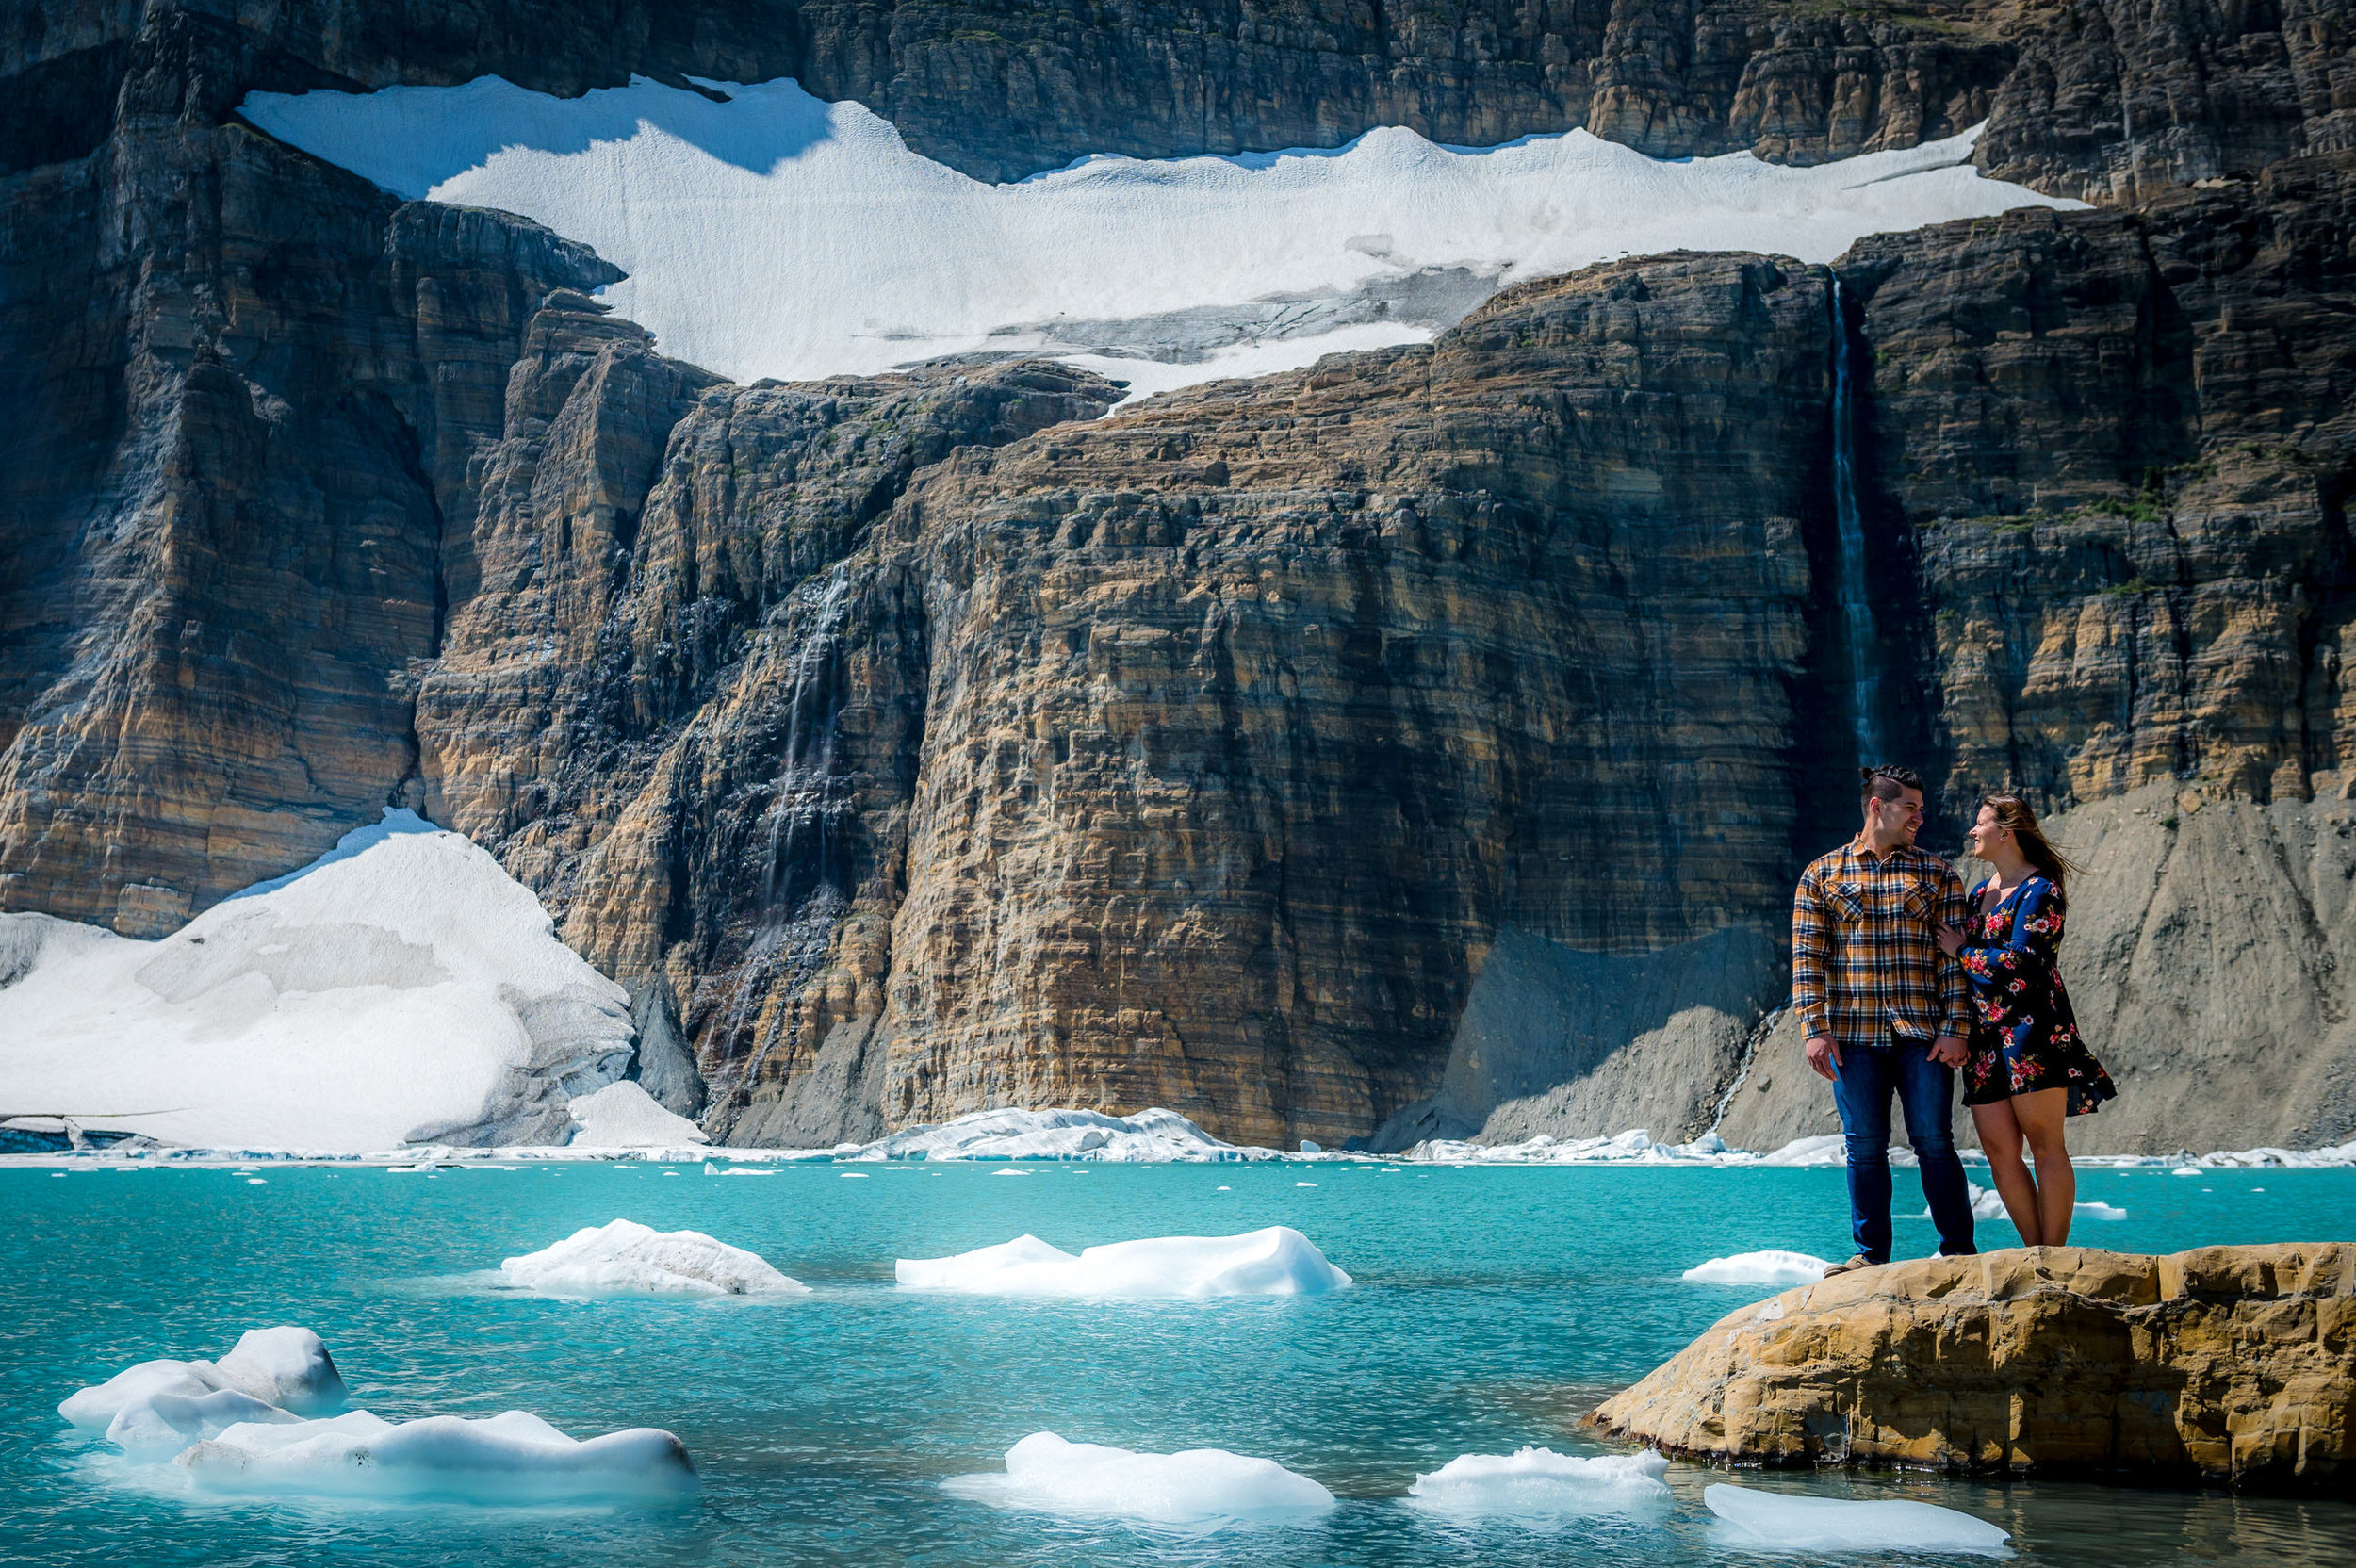 GlacierNationalPark2019-Anna&Bing-1073.jpg